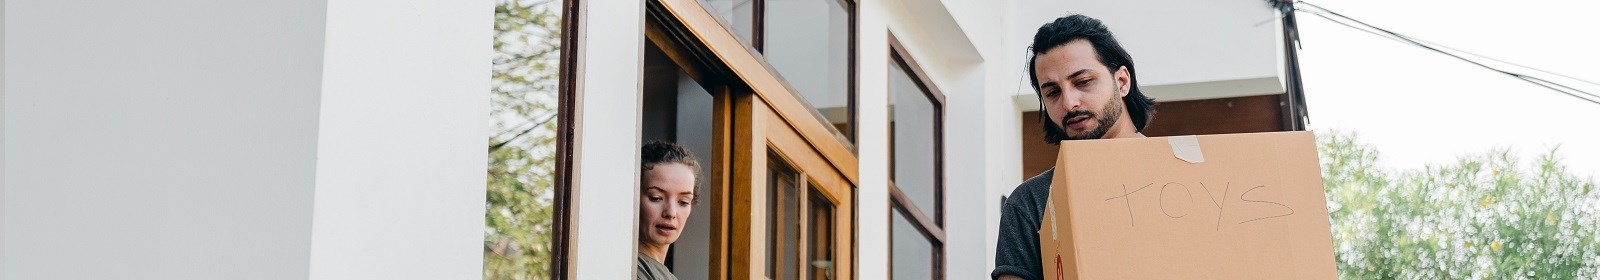 Millennial property buyers piling into top Gauteng suburbs